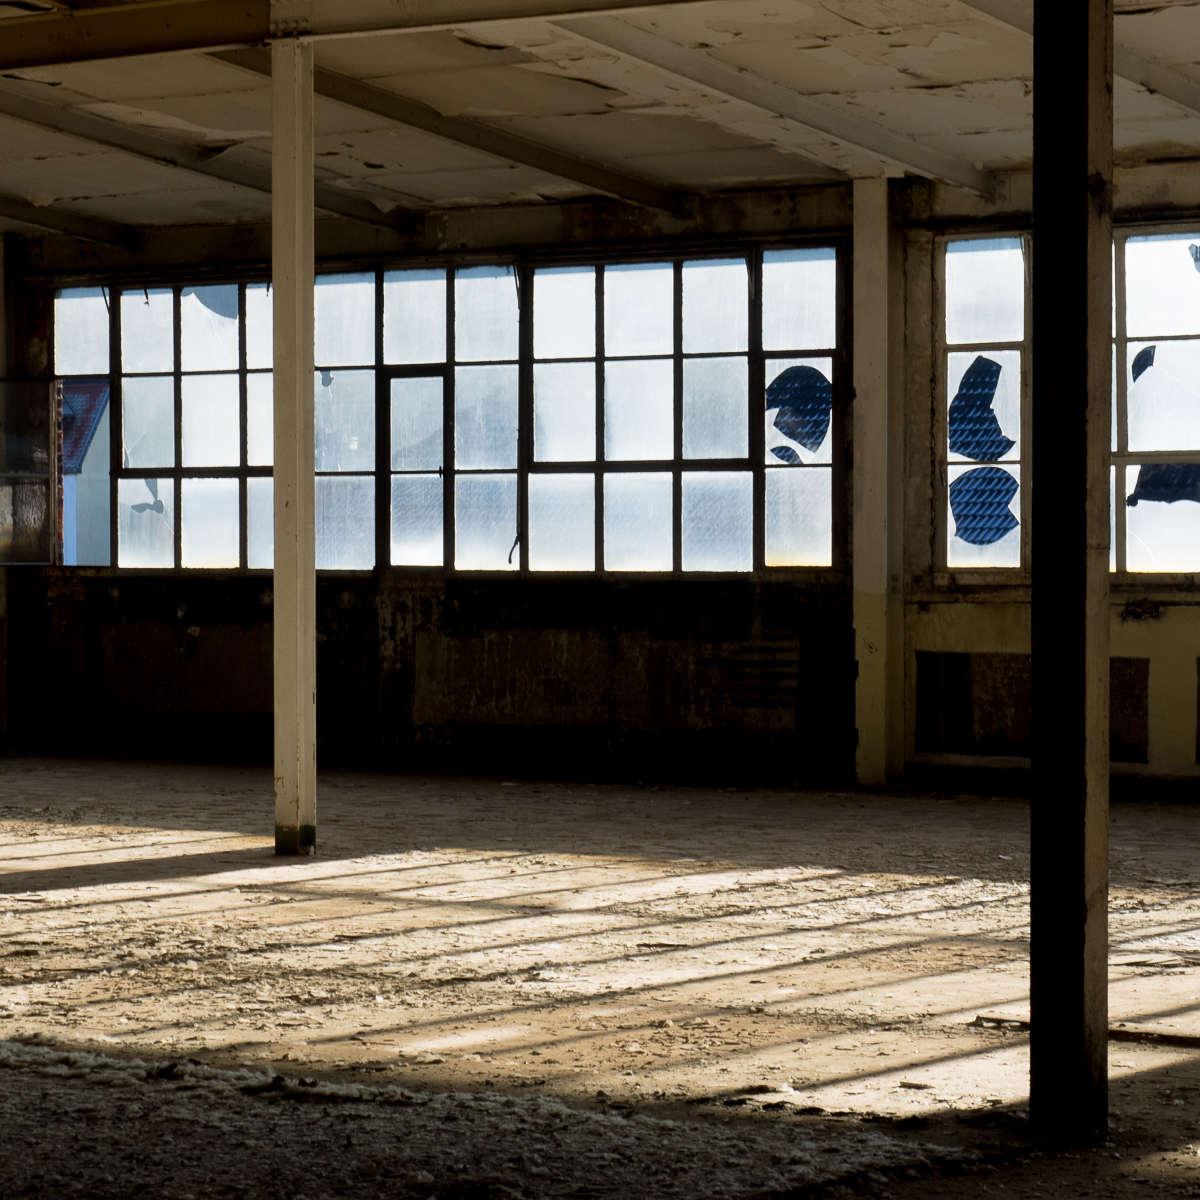 Ruheorte - Ehemalige KFZ Produktionsstätte in Thüringen (Lost Places/Urbex)